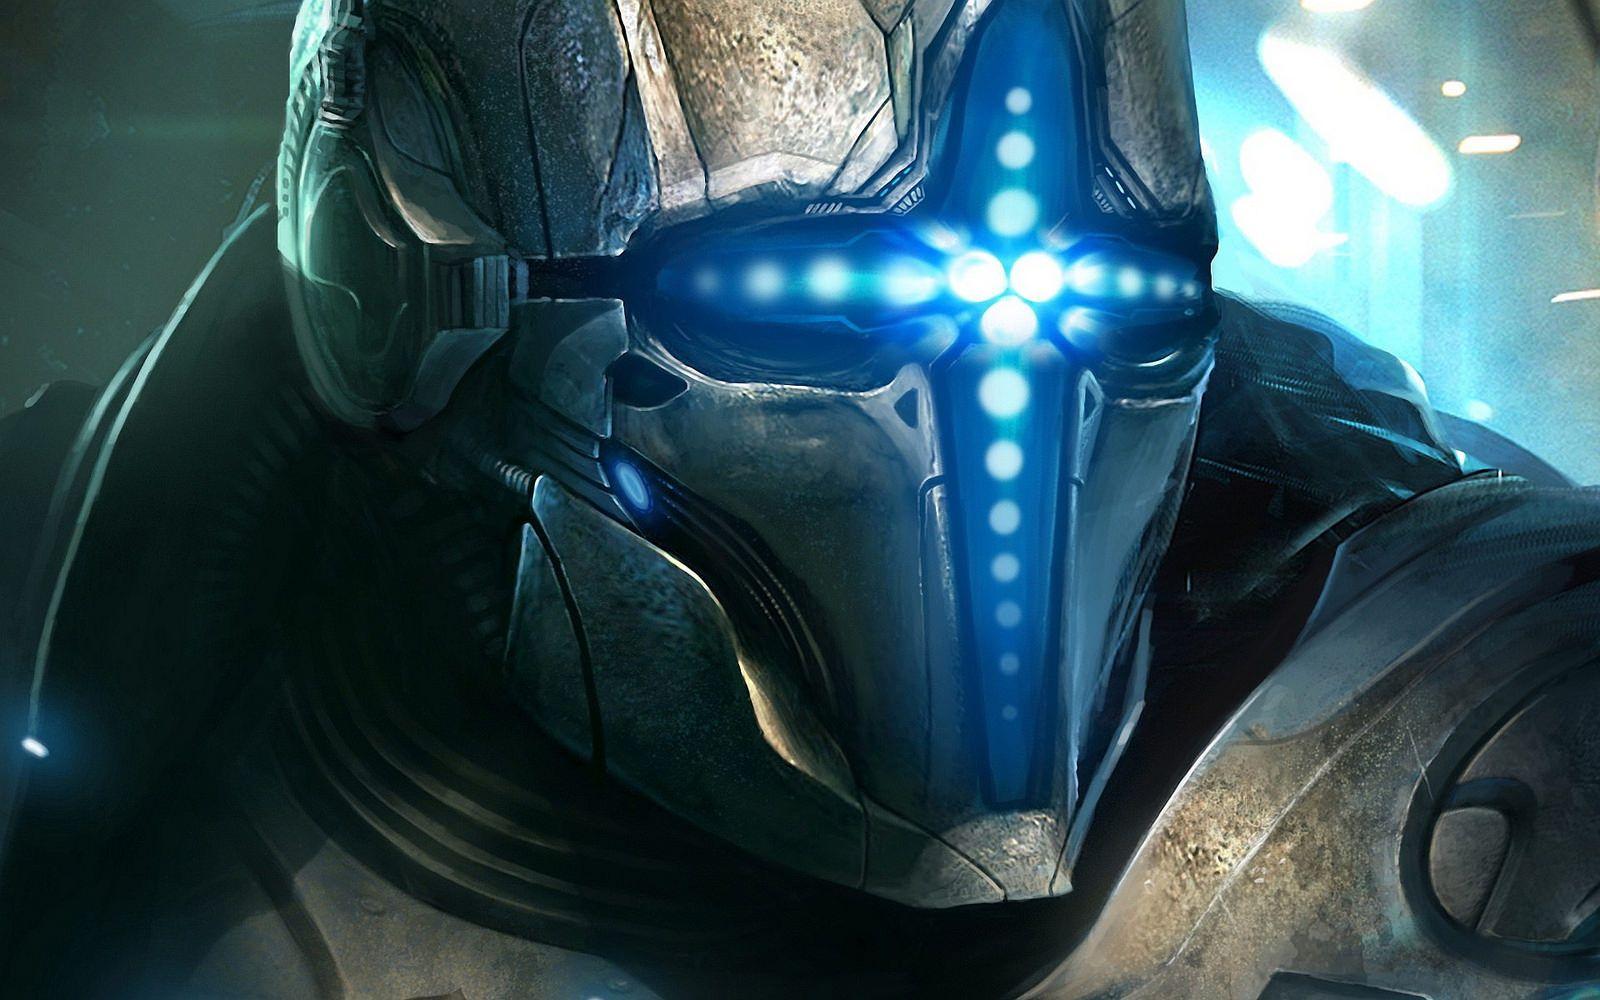 Future Cyborg 1 Helmet Concept Cyborg Soldier Helmet Hd wallpaper sci fi soldier helmet